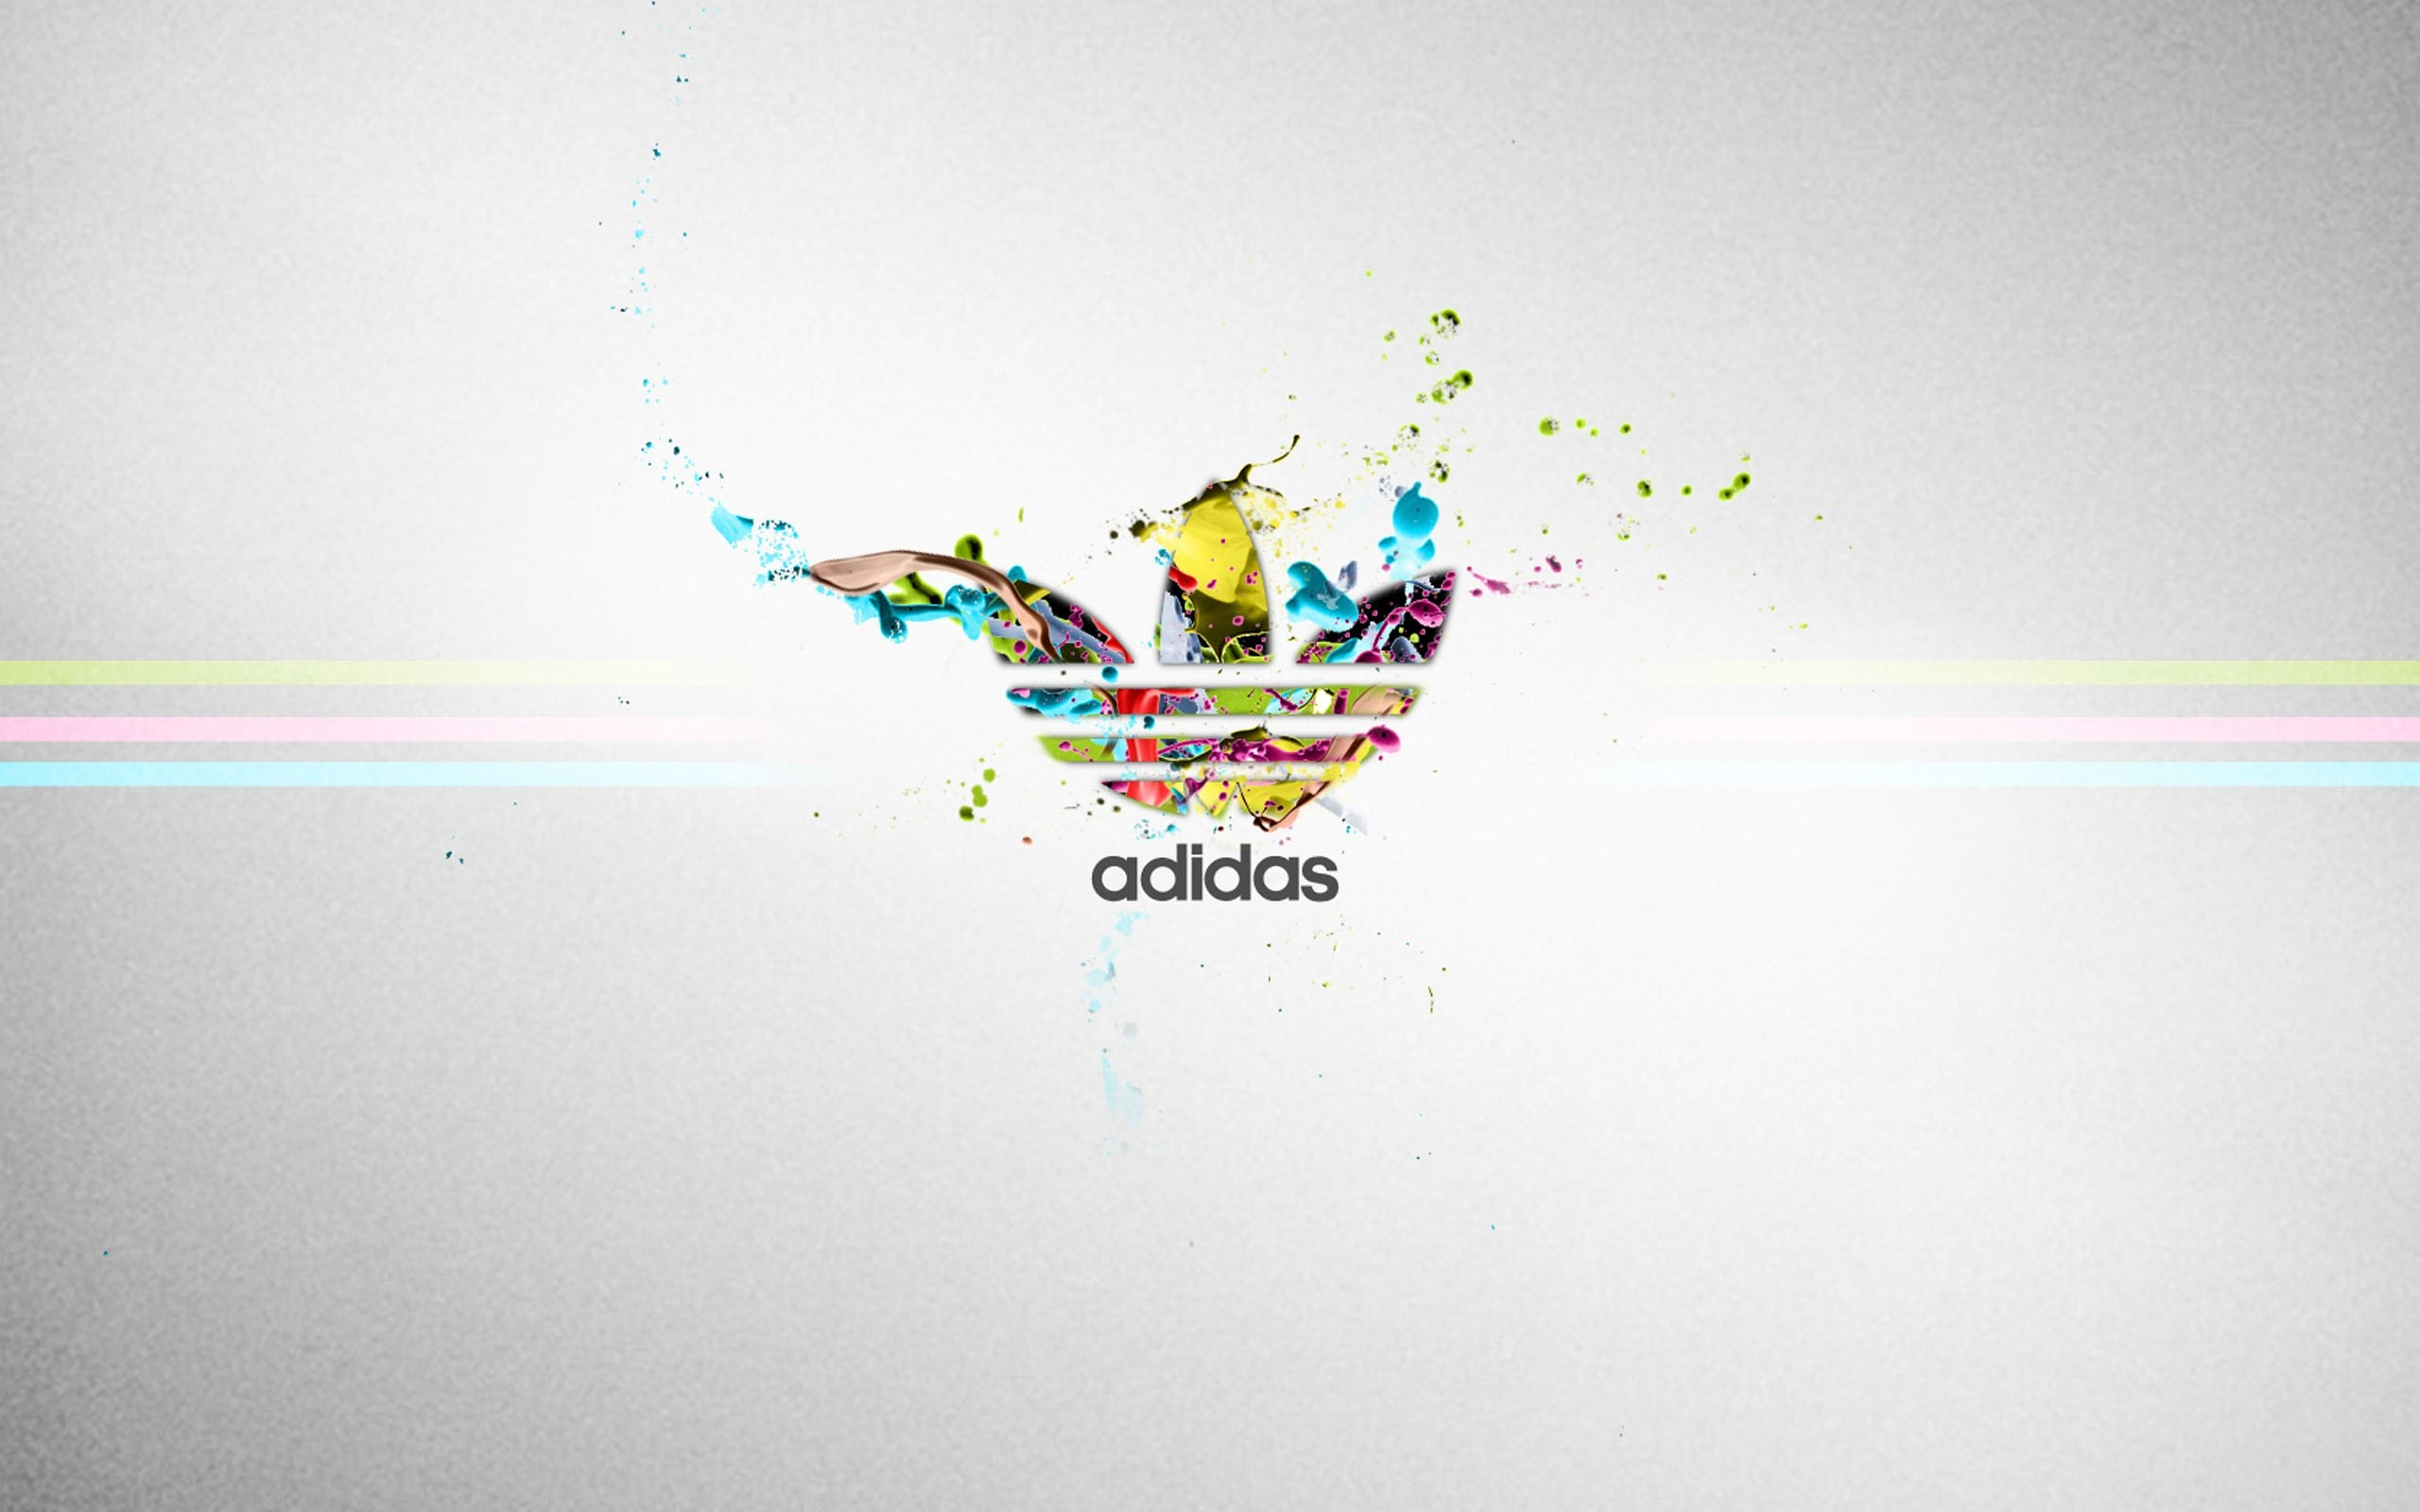 2560x1600 Adidas Wallpaper